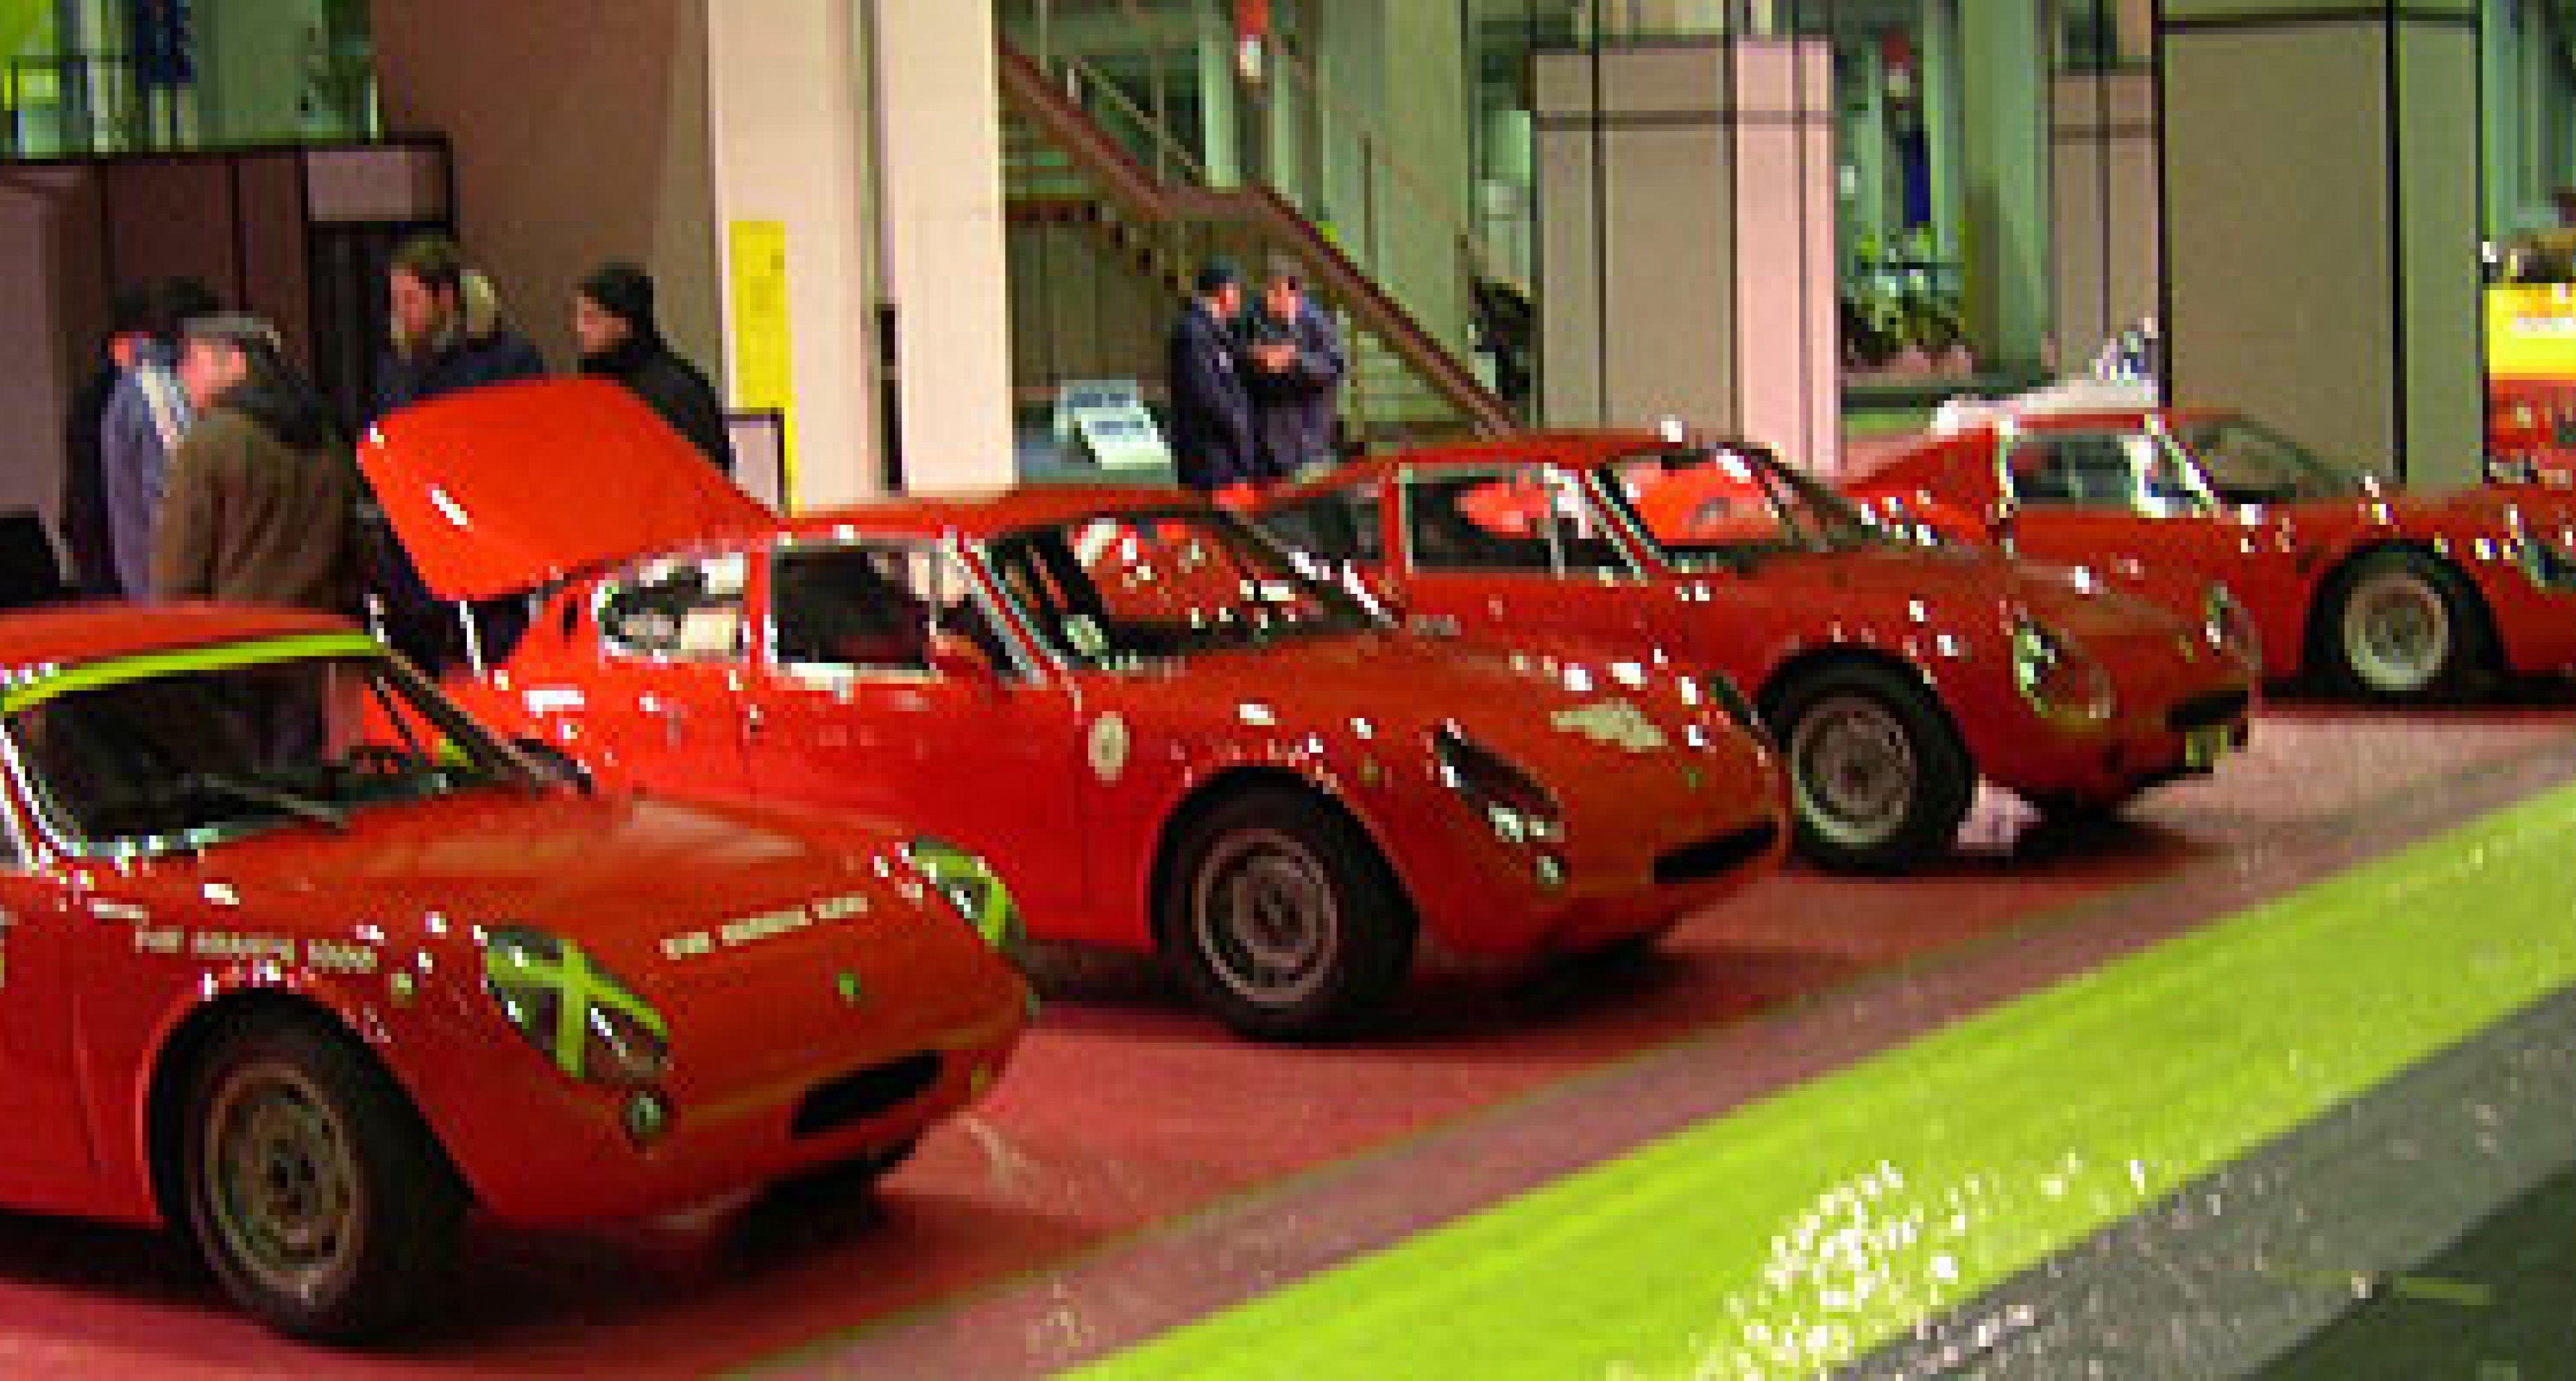 Automotoretrò 2004 feiert 55. Jahre Abarth